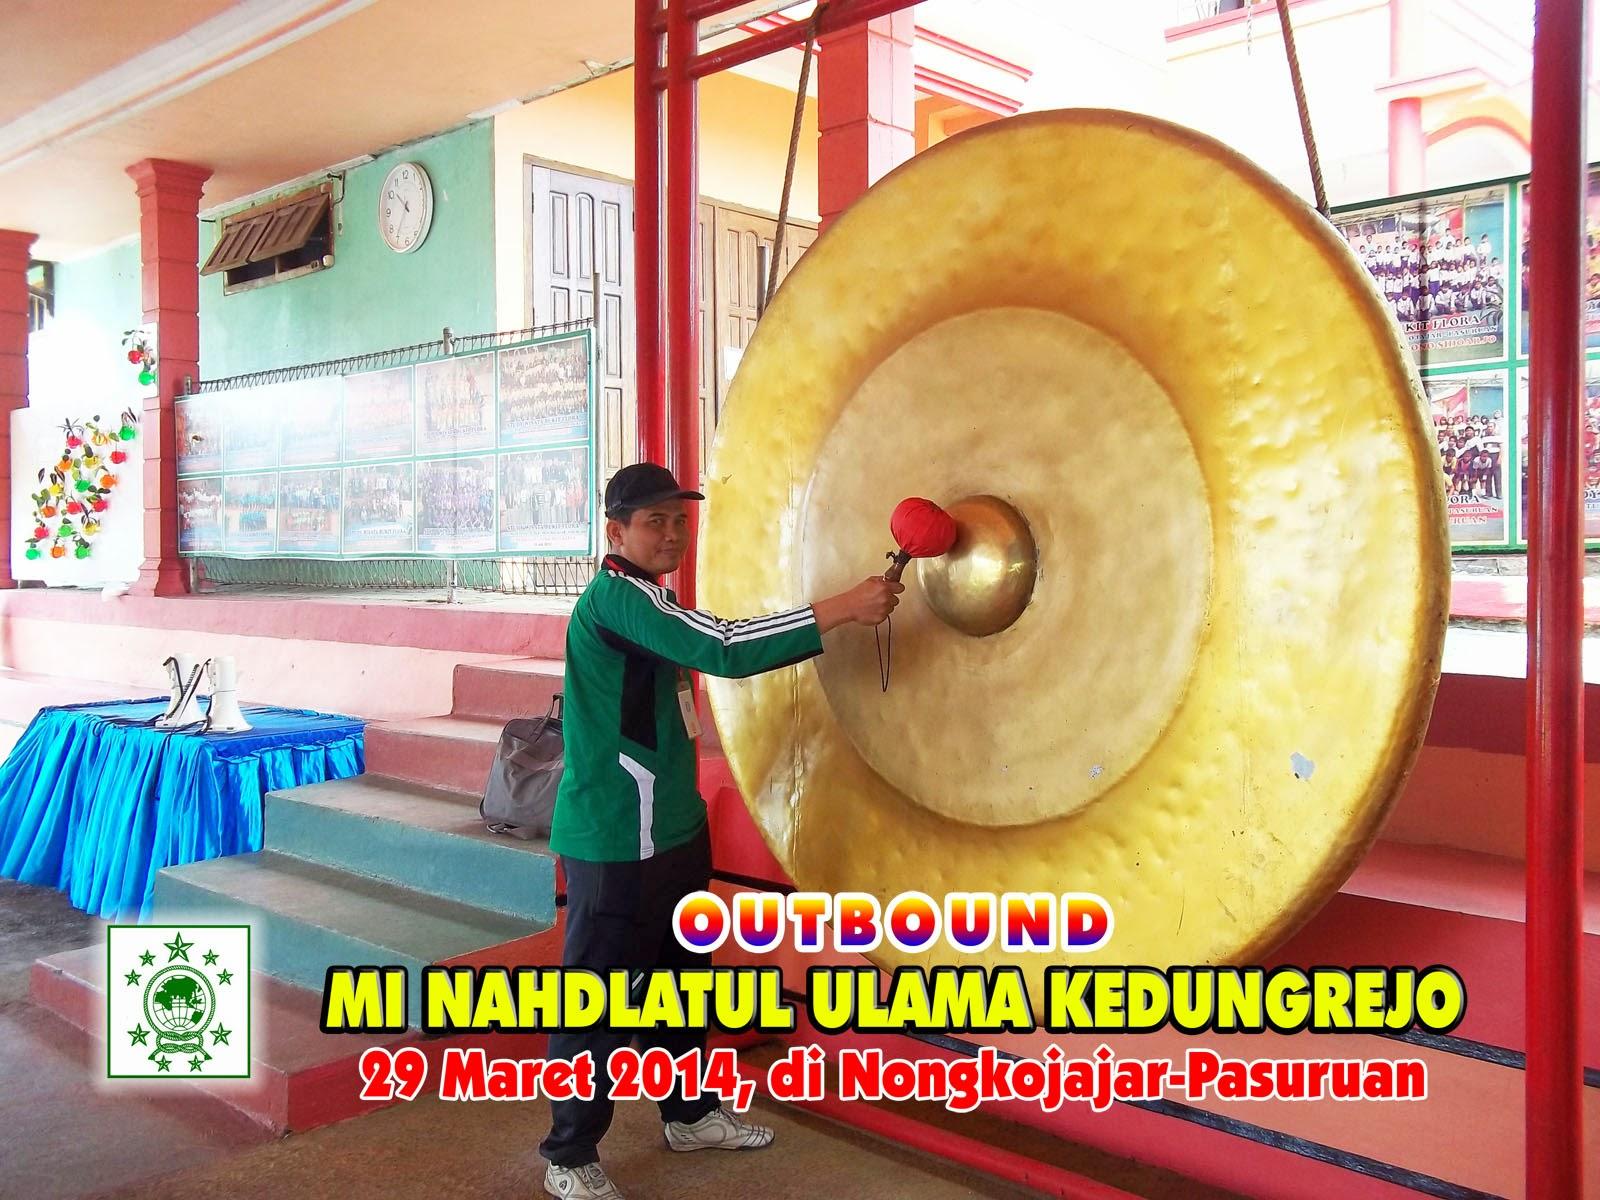 Mi Nahdlatul Ulama Kedungrejo Outbound 2014 Bukit Flora Kepala Madrasah